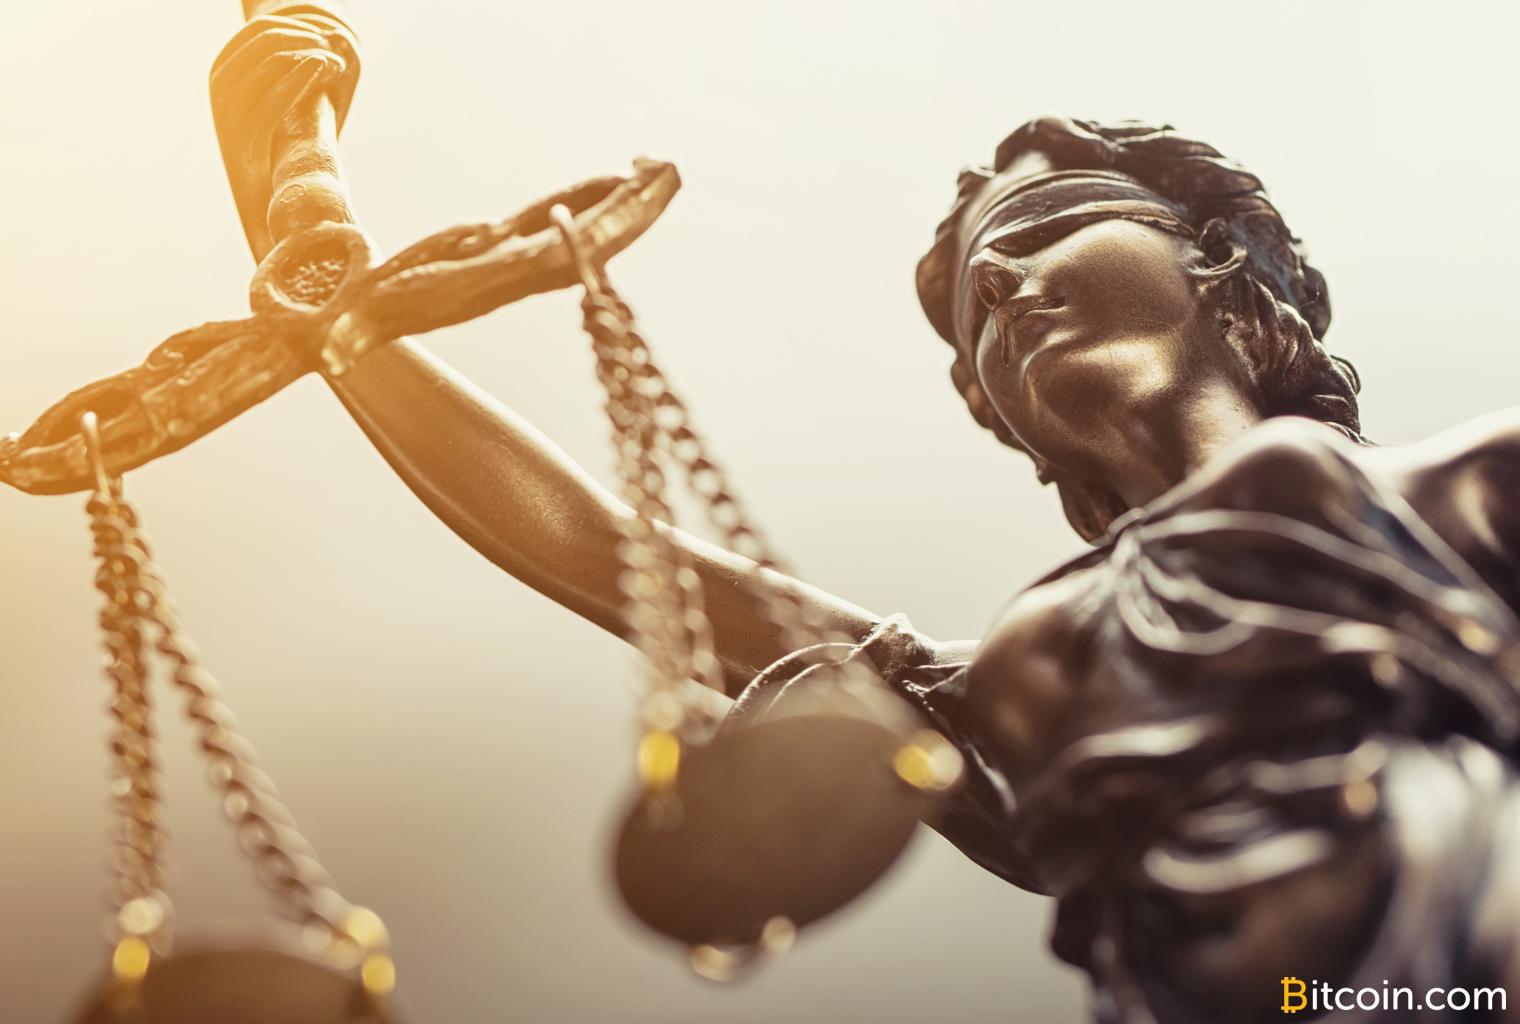 Kleiman Estate Says 'Satoshi Reveal Is Relevant' in Billion Dollar Bitcoin Lawsuit